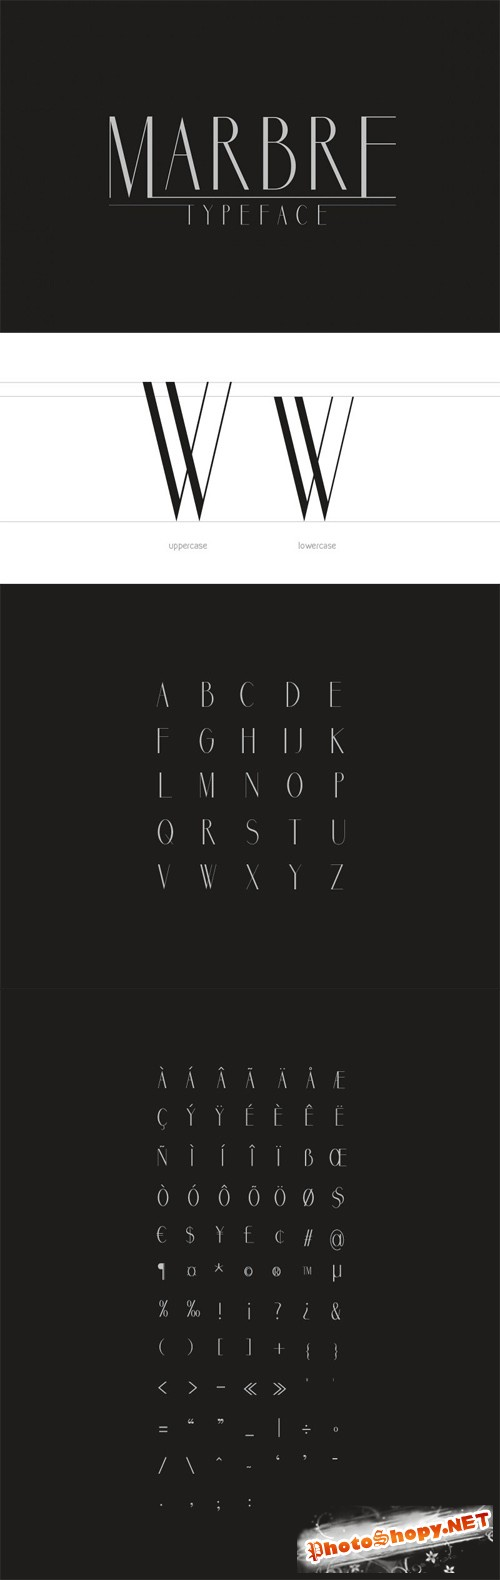 Font - Marbre Vintage Style